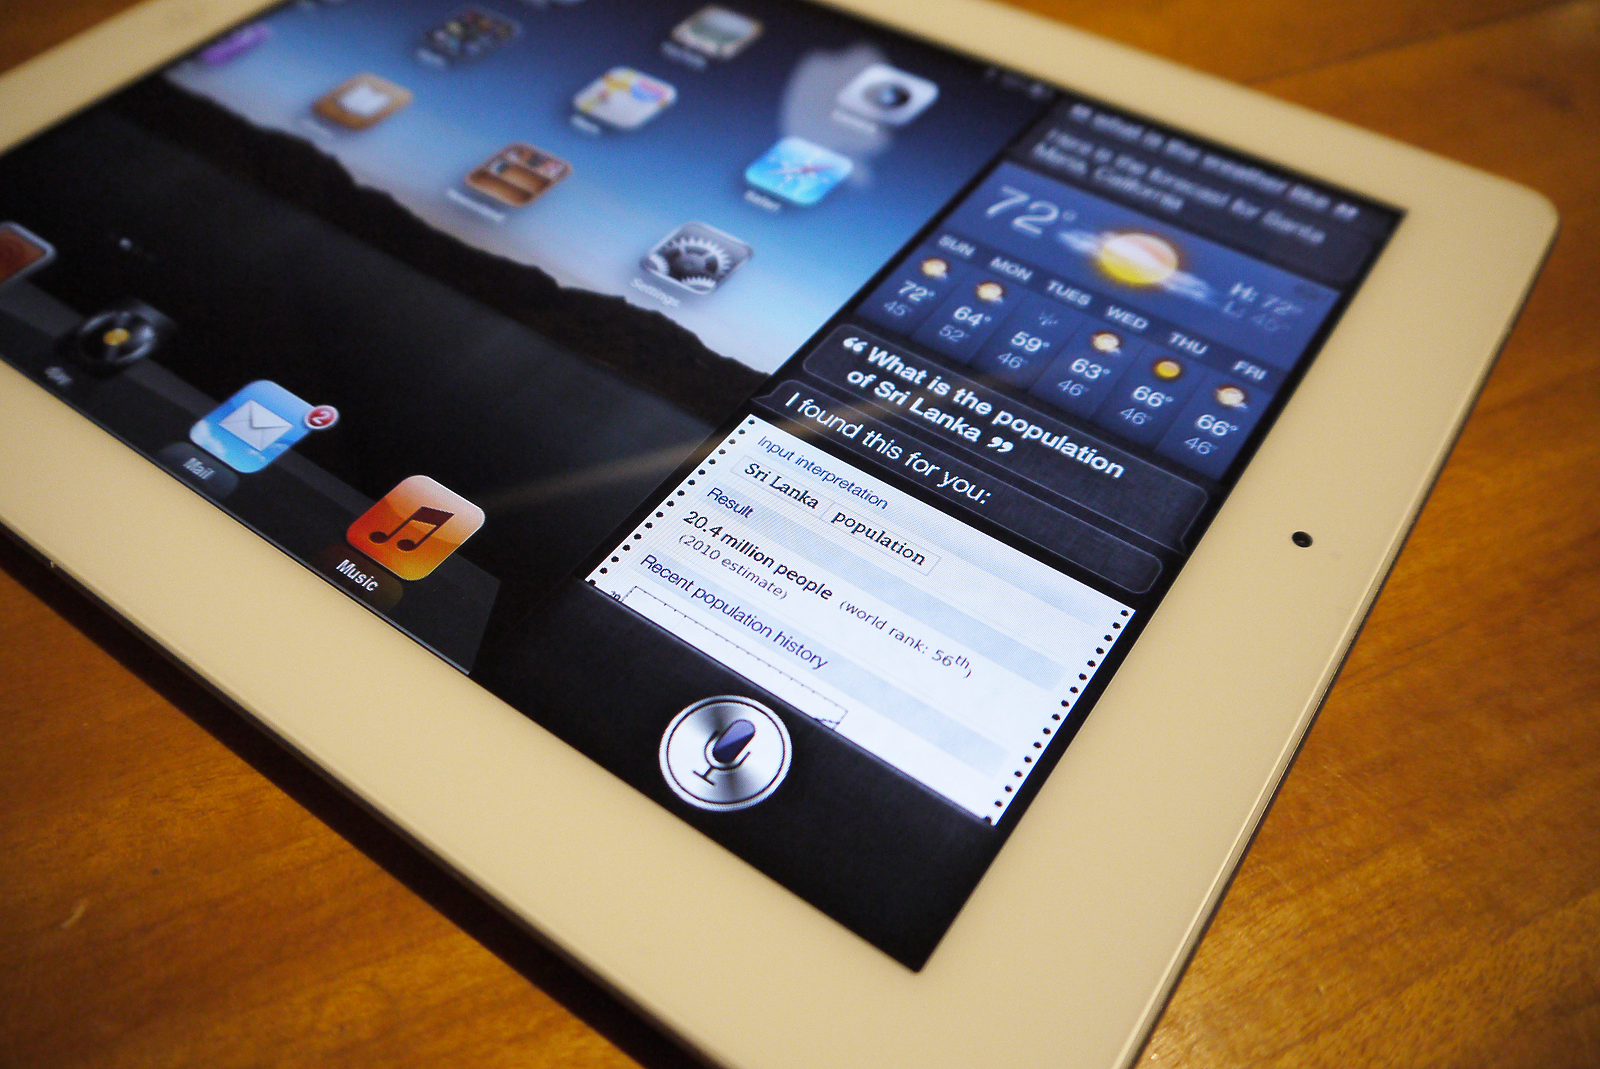 Conceitos da Siri no Mac e no iPad